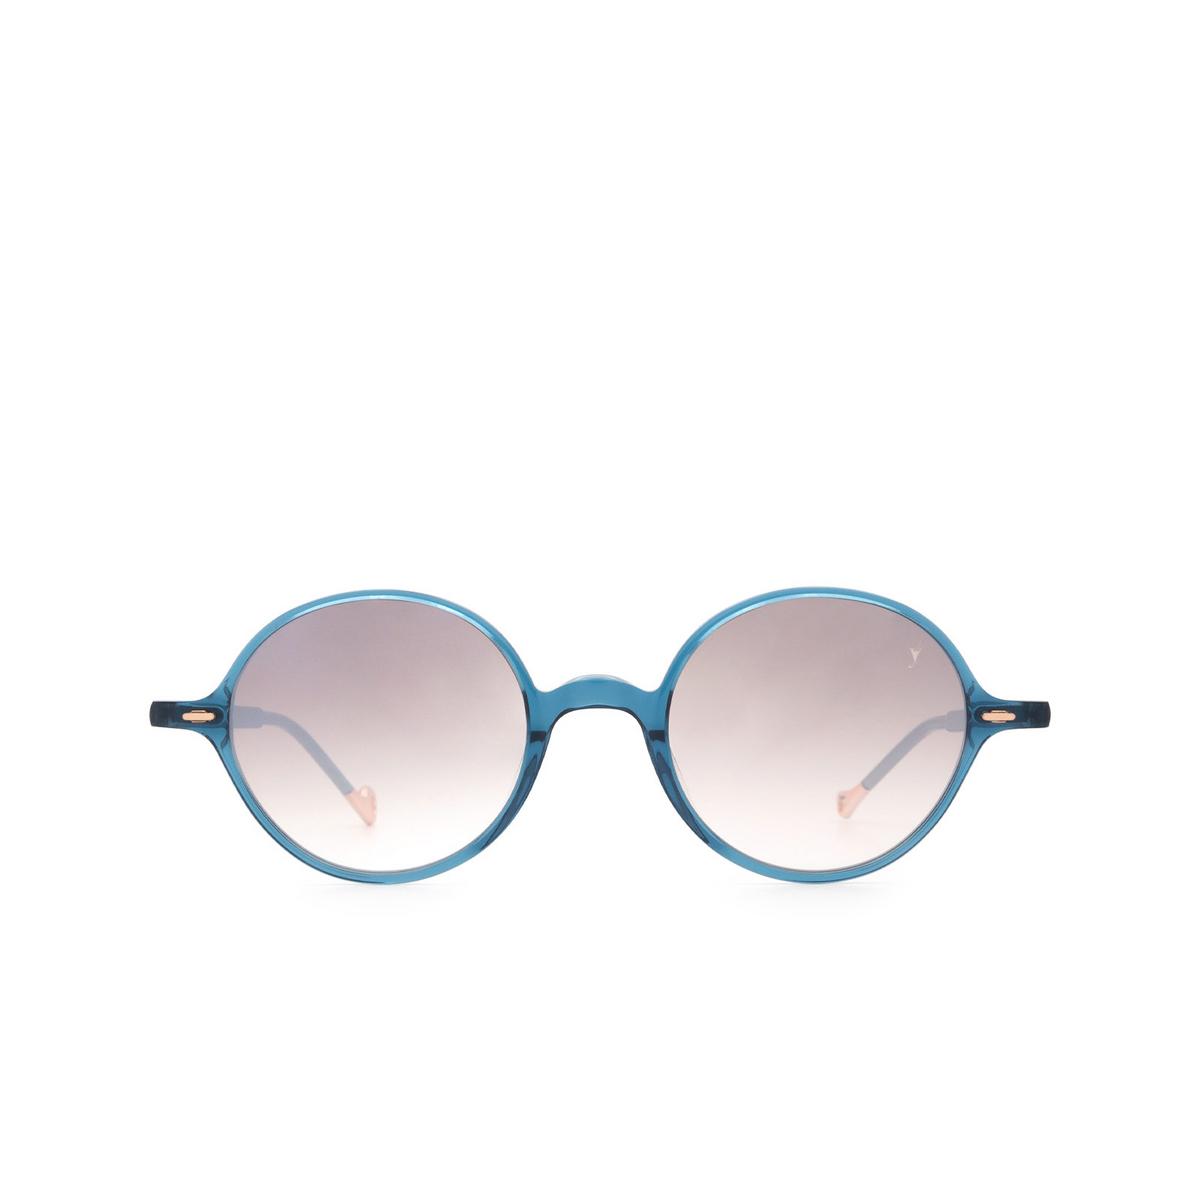 Eyepetizer® Round Sunglasses: Pallavicini color Blue C.Z-18F - front view.